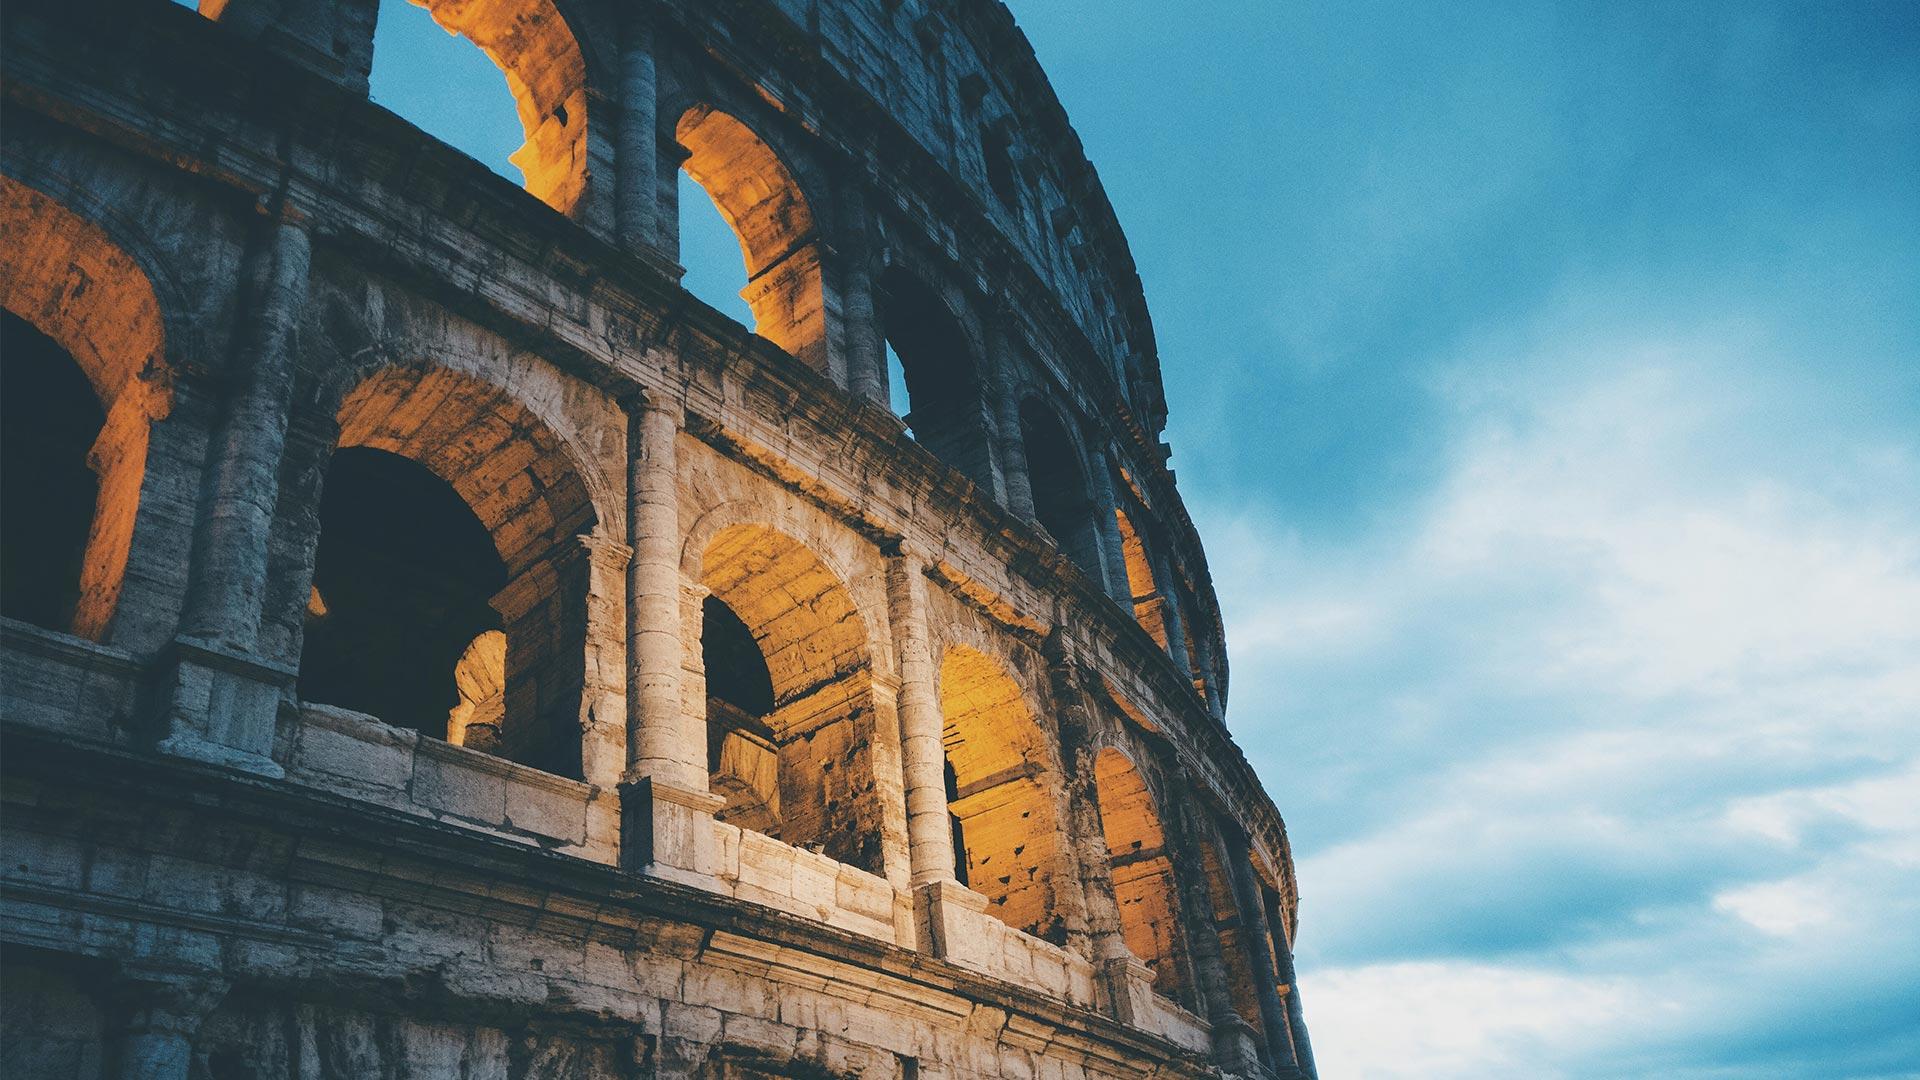 colosseum rome italy medieval roman